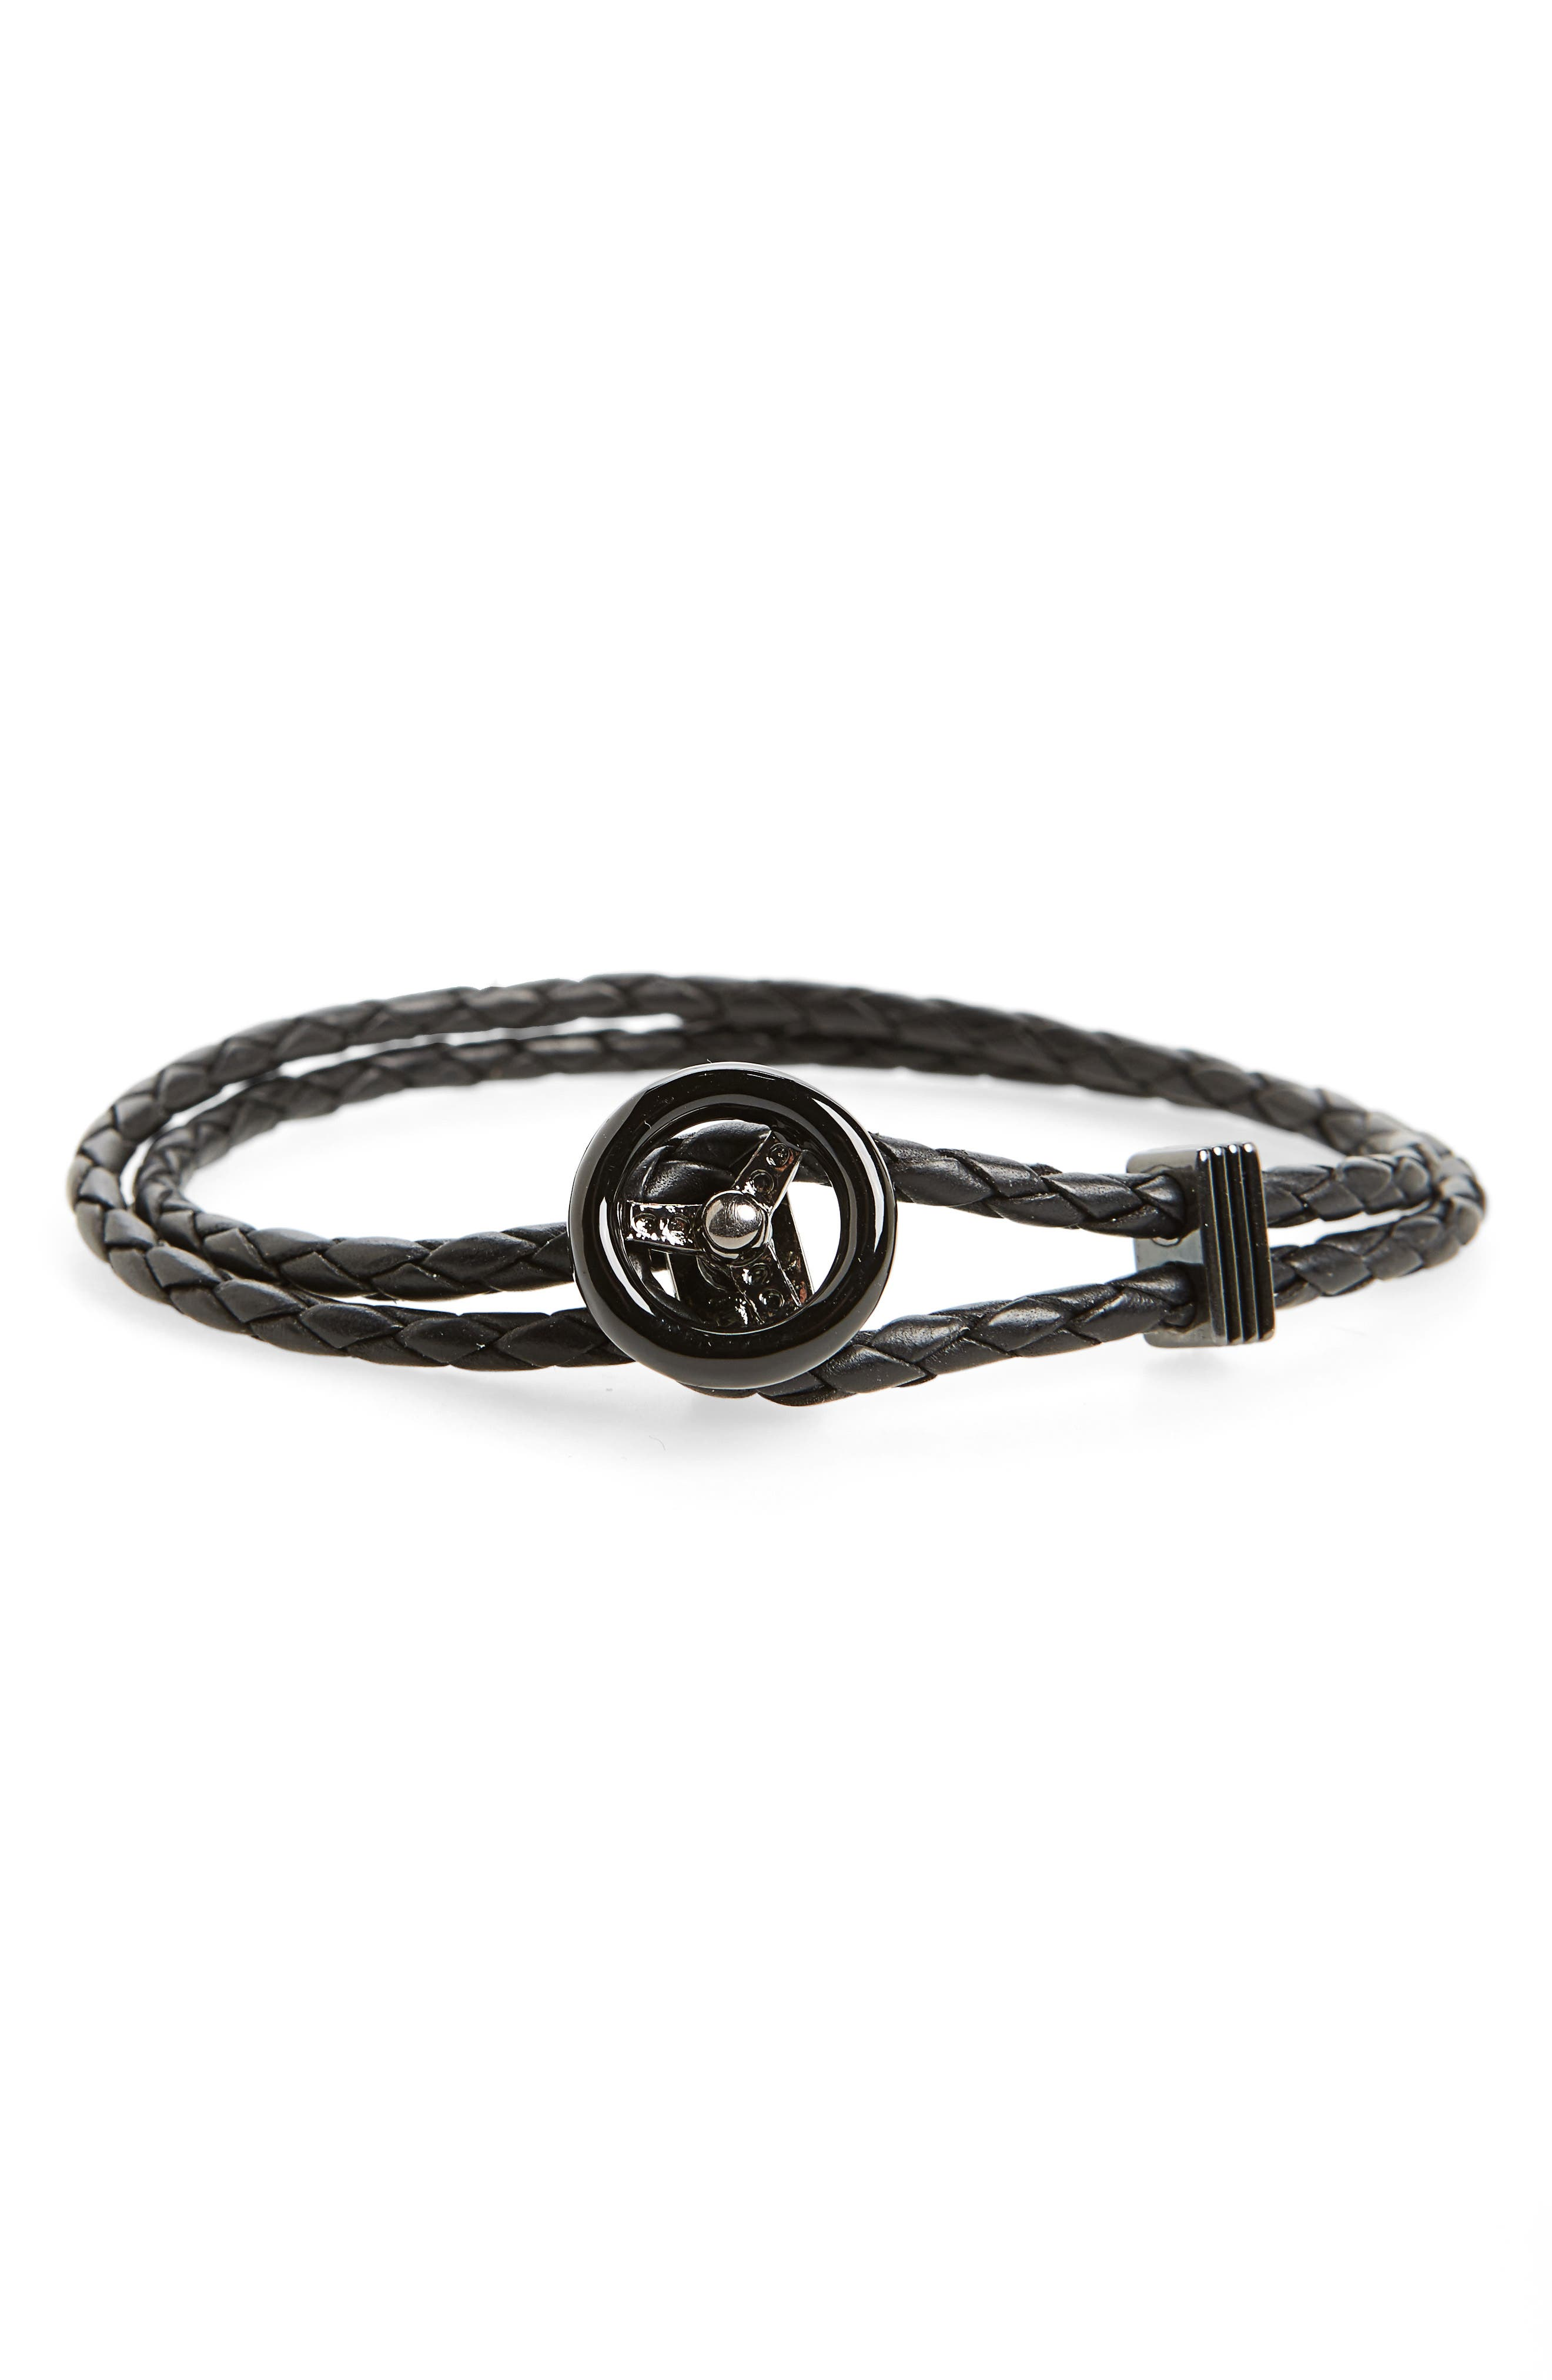 Alternate Image 1 Selected - Link Up Steering Wheel Braided Leather Bracelet